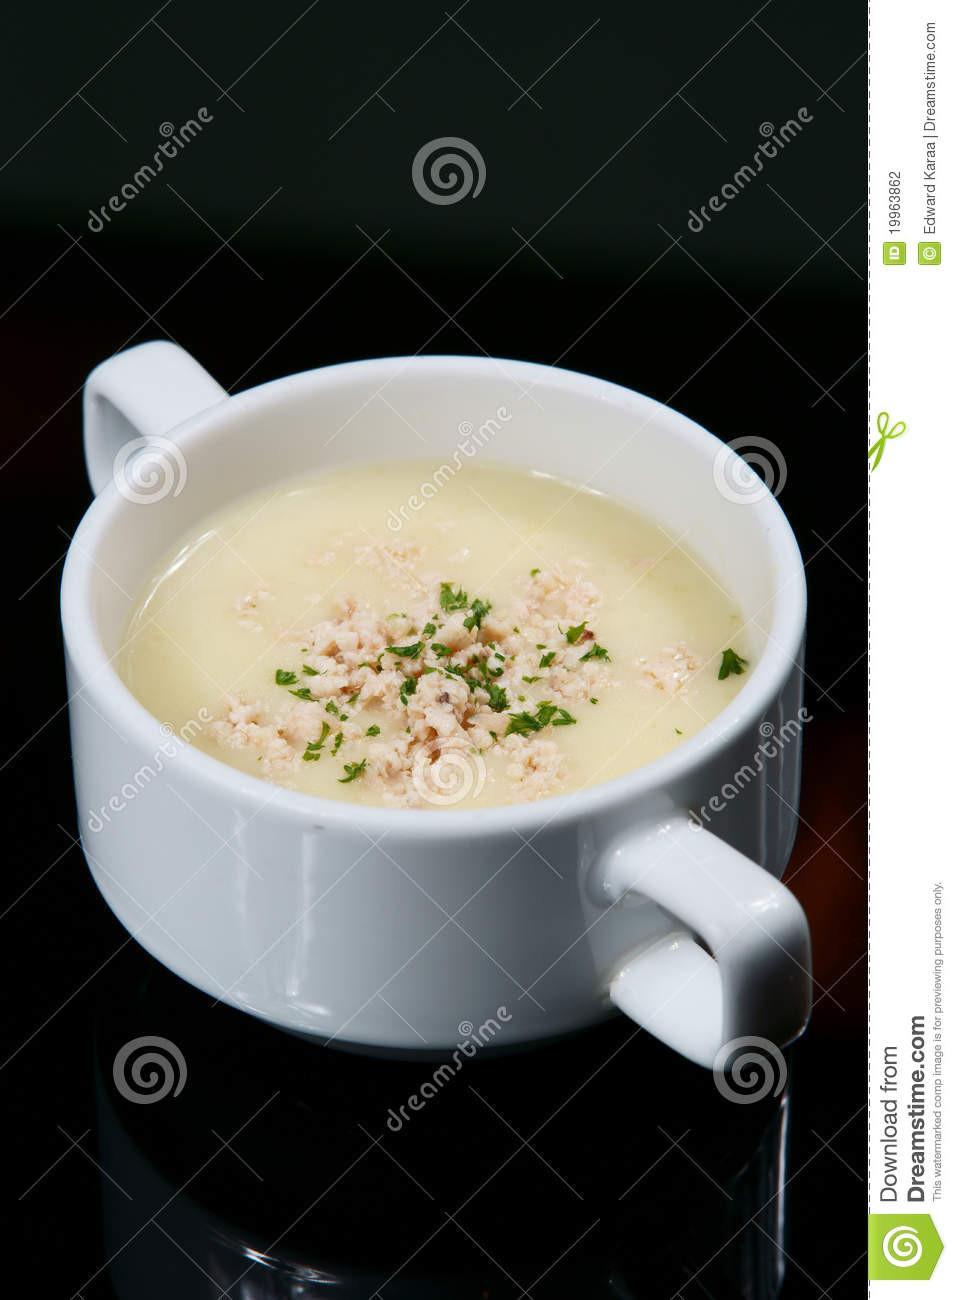 Cream Of Shrimp Soup  Shrimp Cream Soup stock photo Image of food french